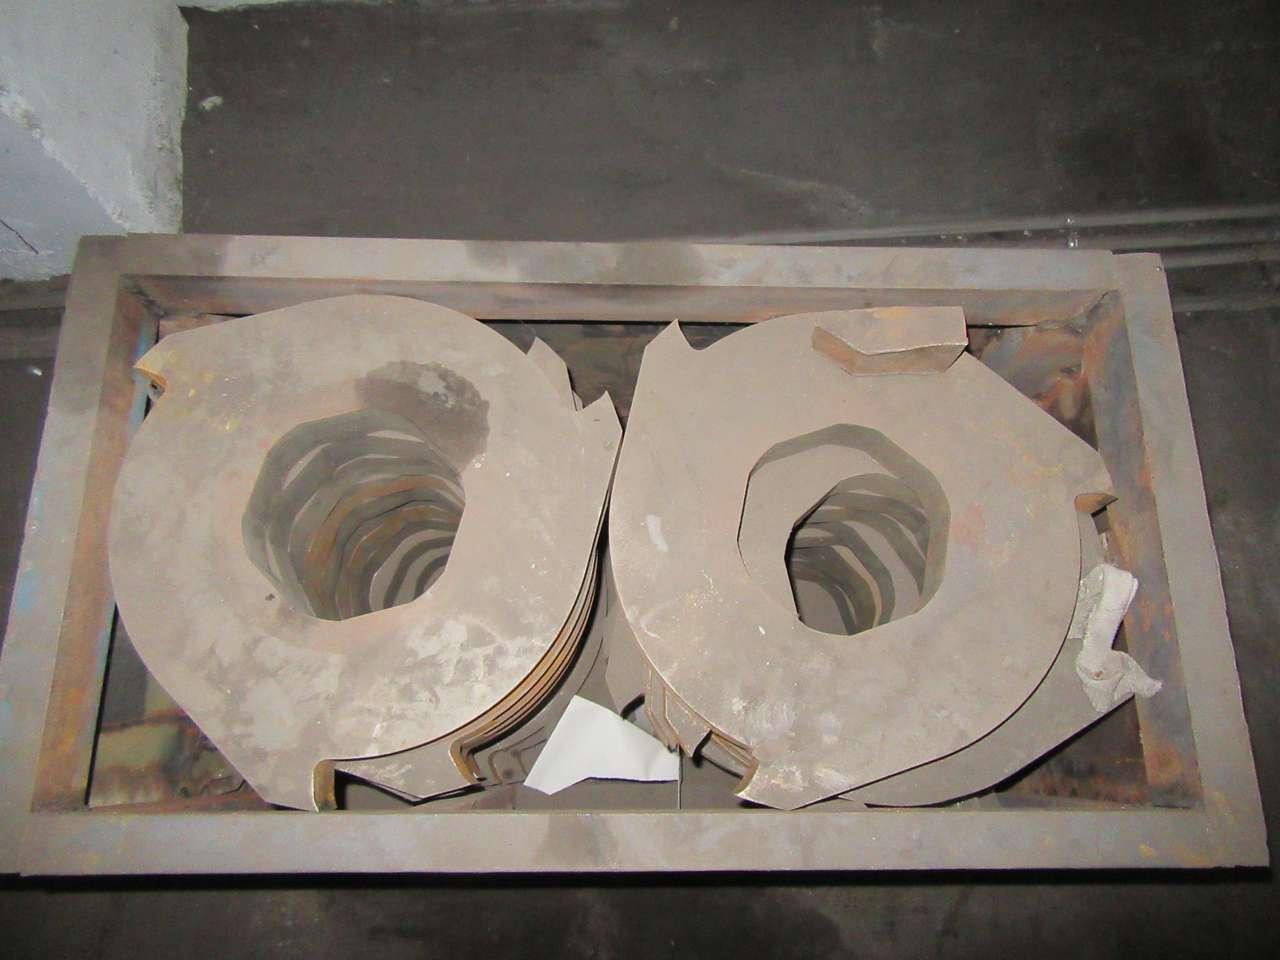 Lot 59 - 2014 Jiangyin Jinall International Trade Co. LPS-1200 Tire Shredder